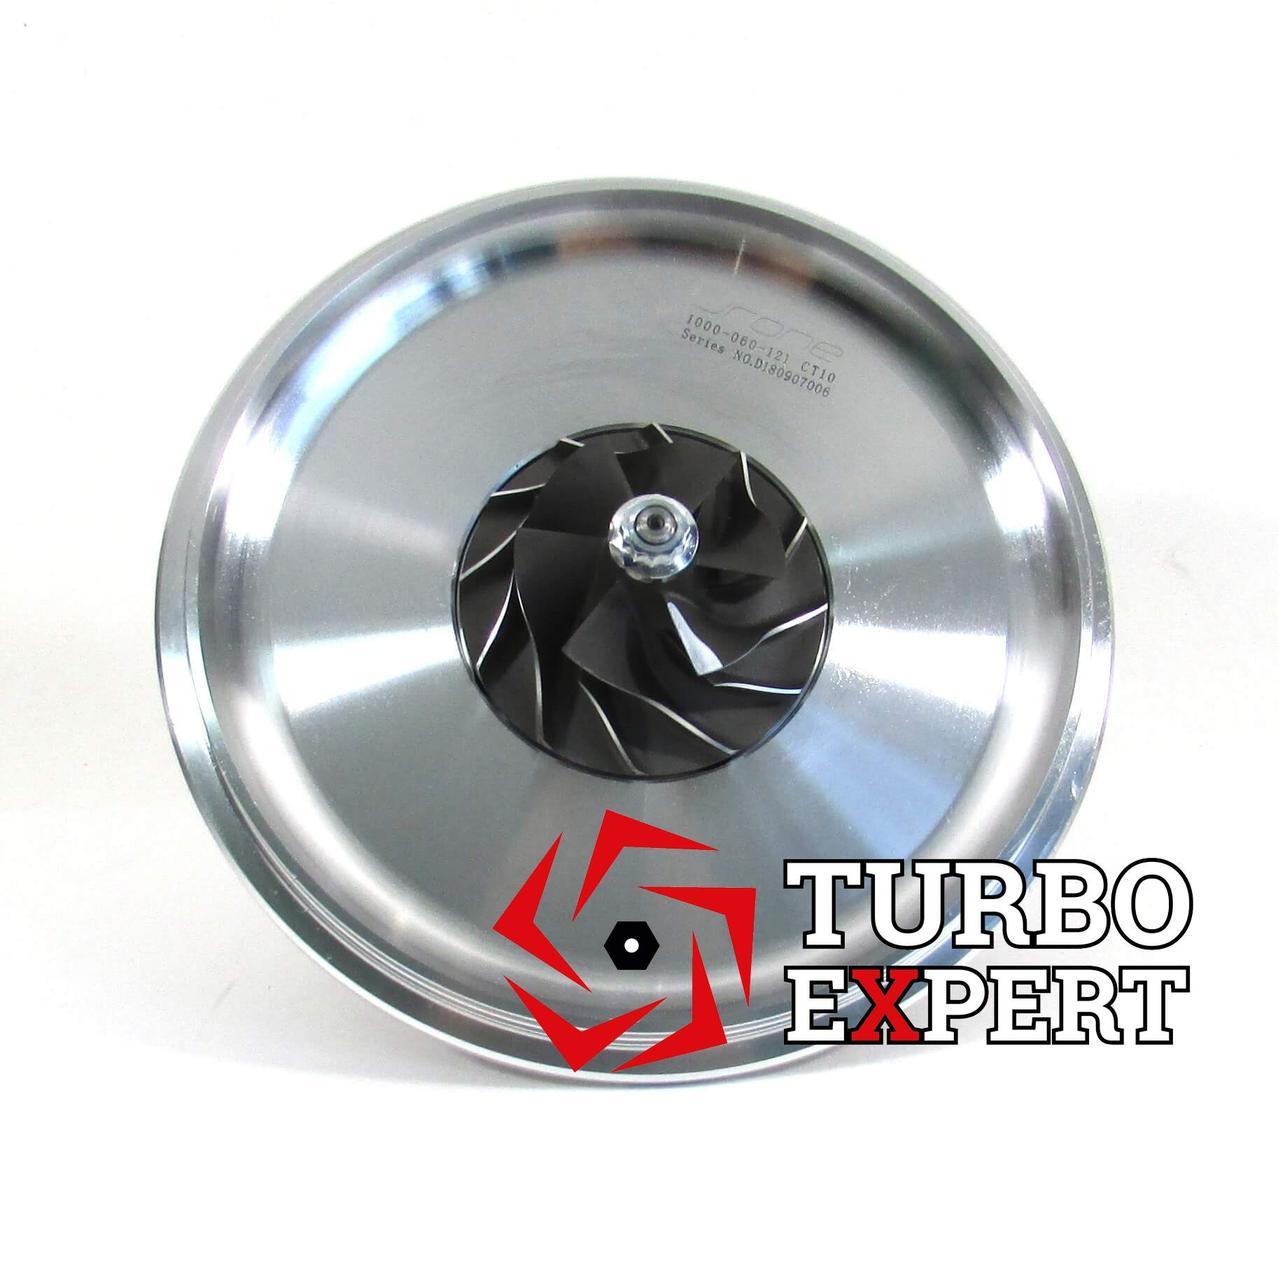 Картридж турбины 17201-30141, Toyota Hilux 2.5 D4D, 88 Kw, 2KD-FTV, 17201-30140, 2007+